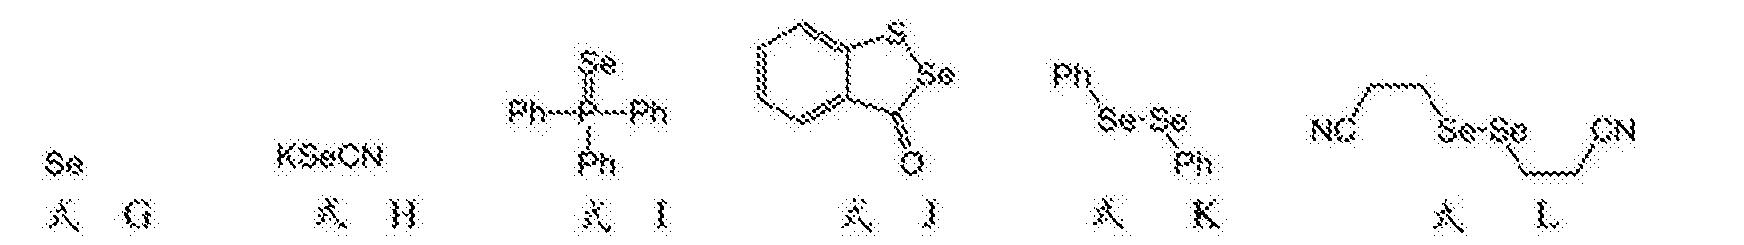 Figure CN107011400AD00181